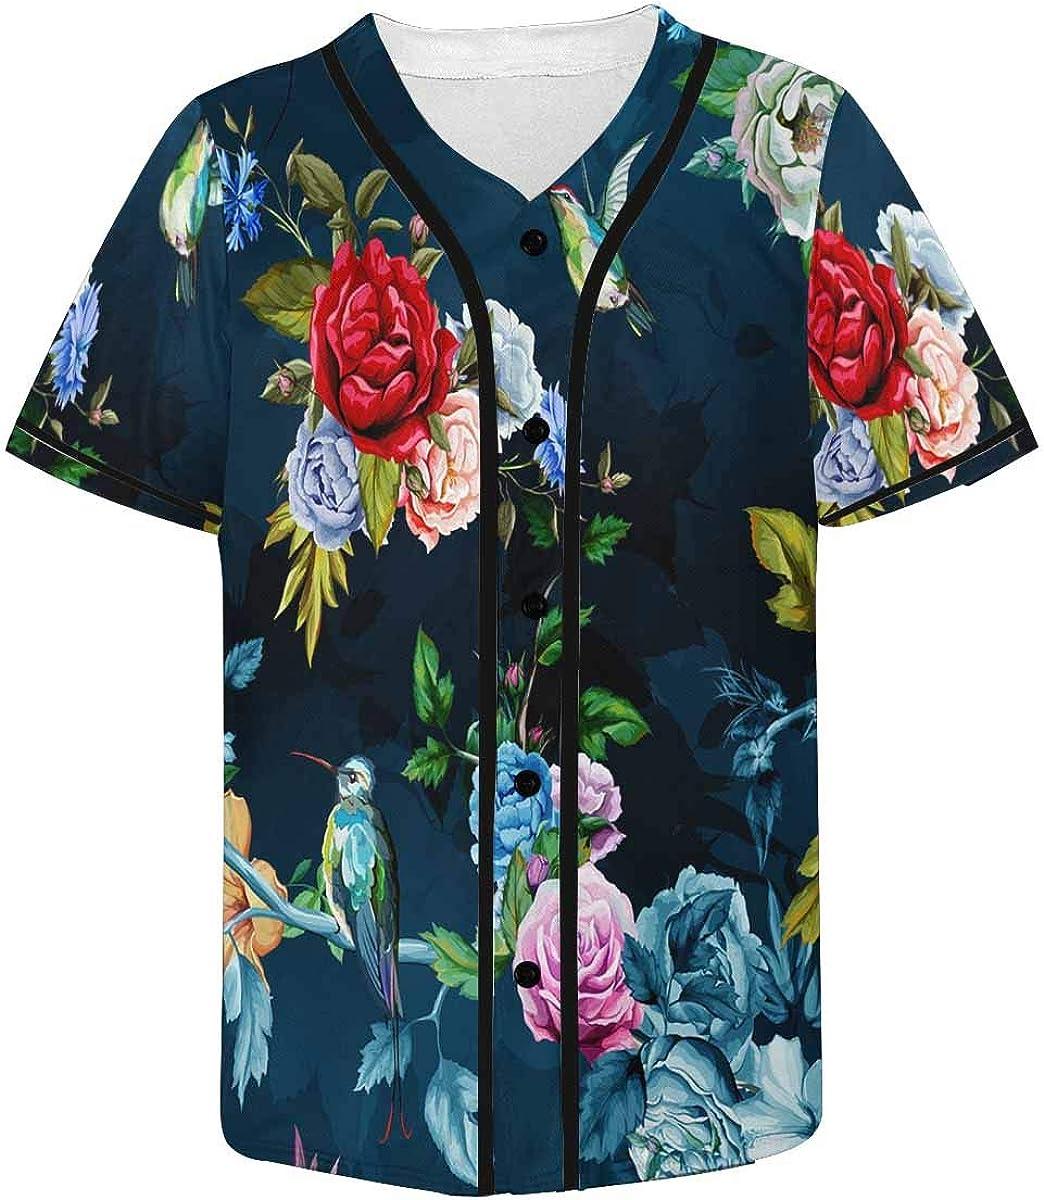 Amazon Com Interestprint Humming Bird Wild Roses Peony Cornflower Leaves Baseball Jersey For Men Clothing